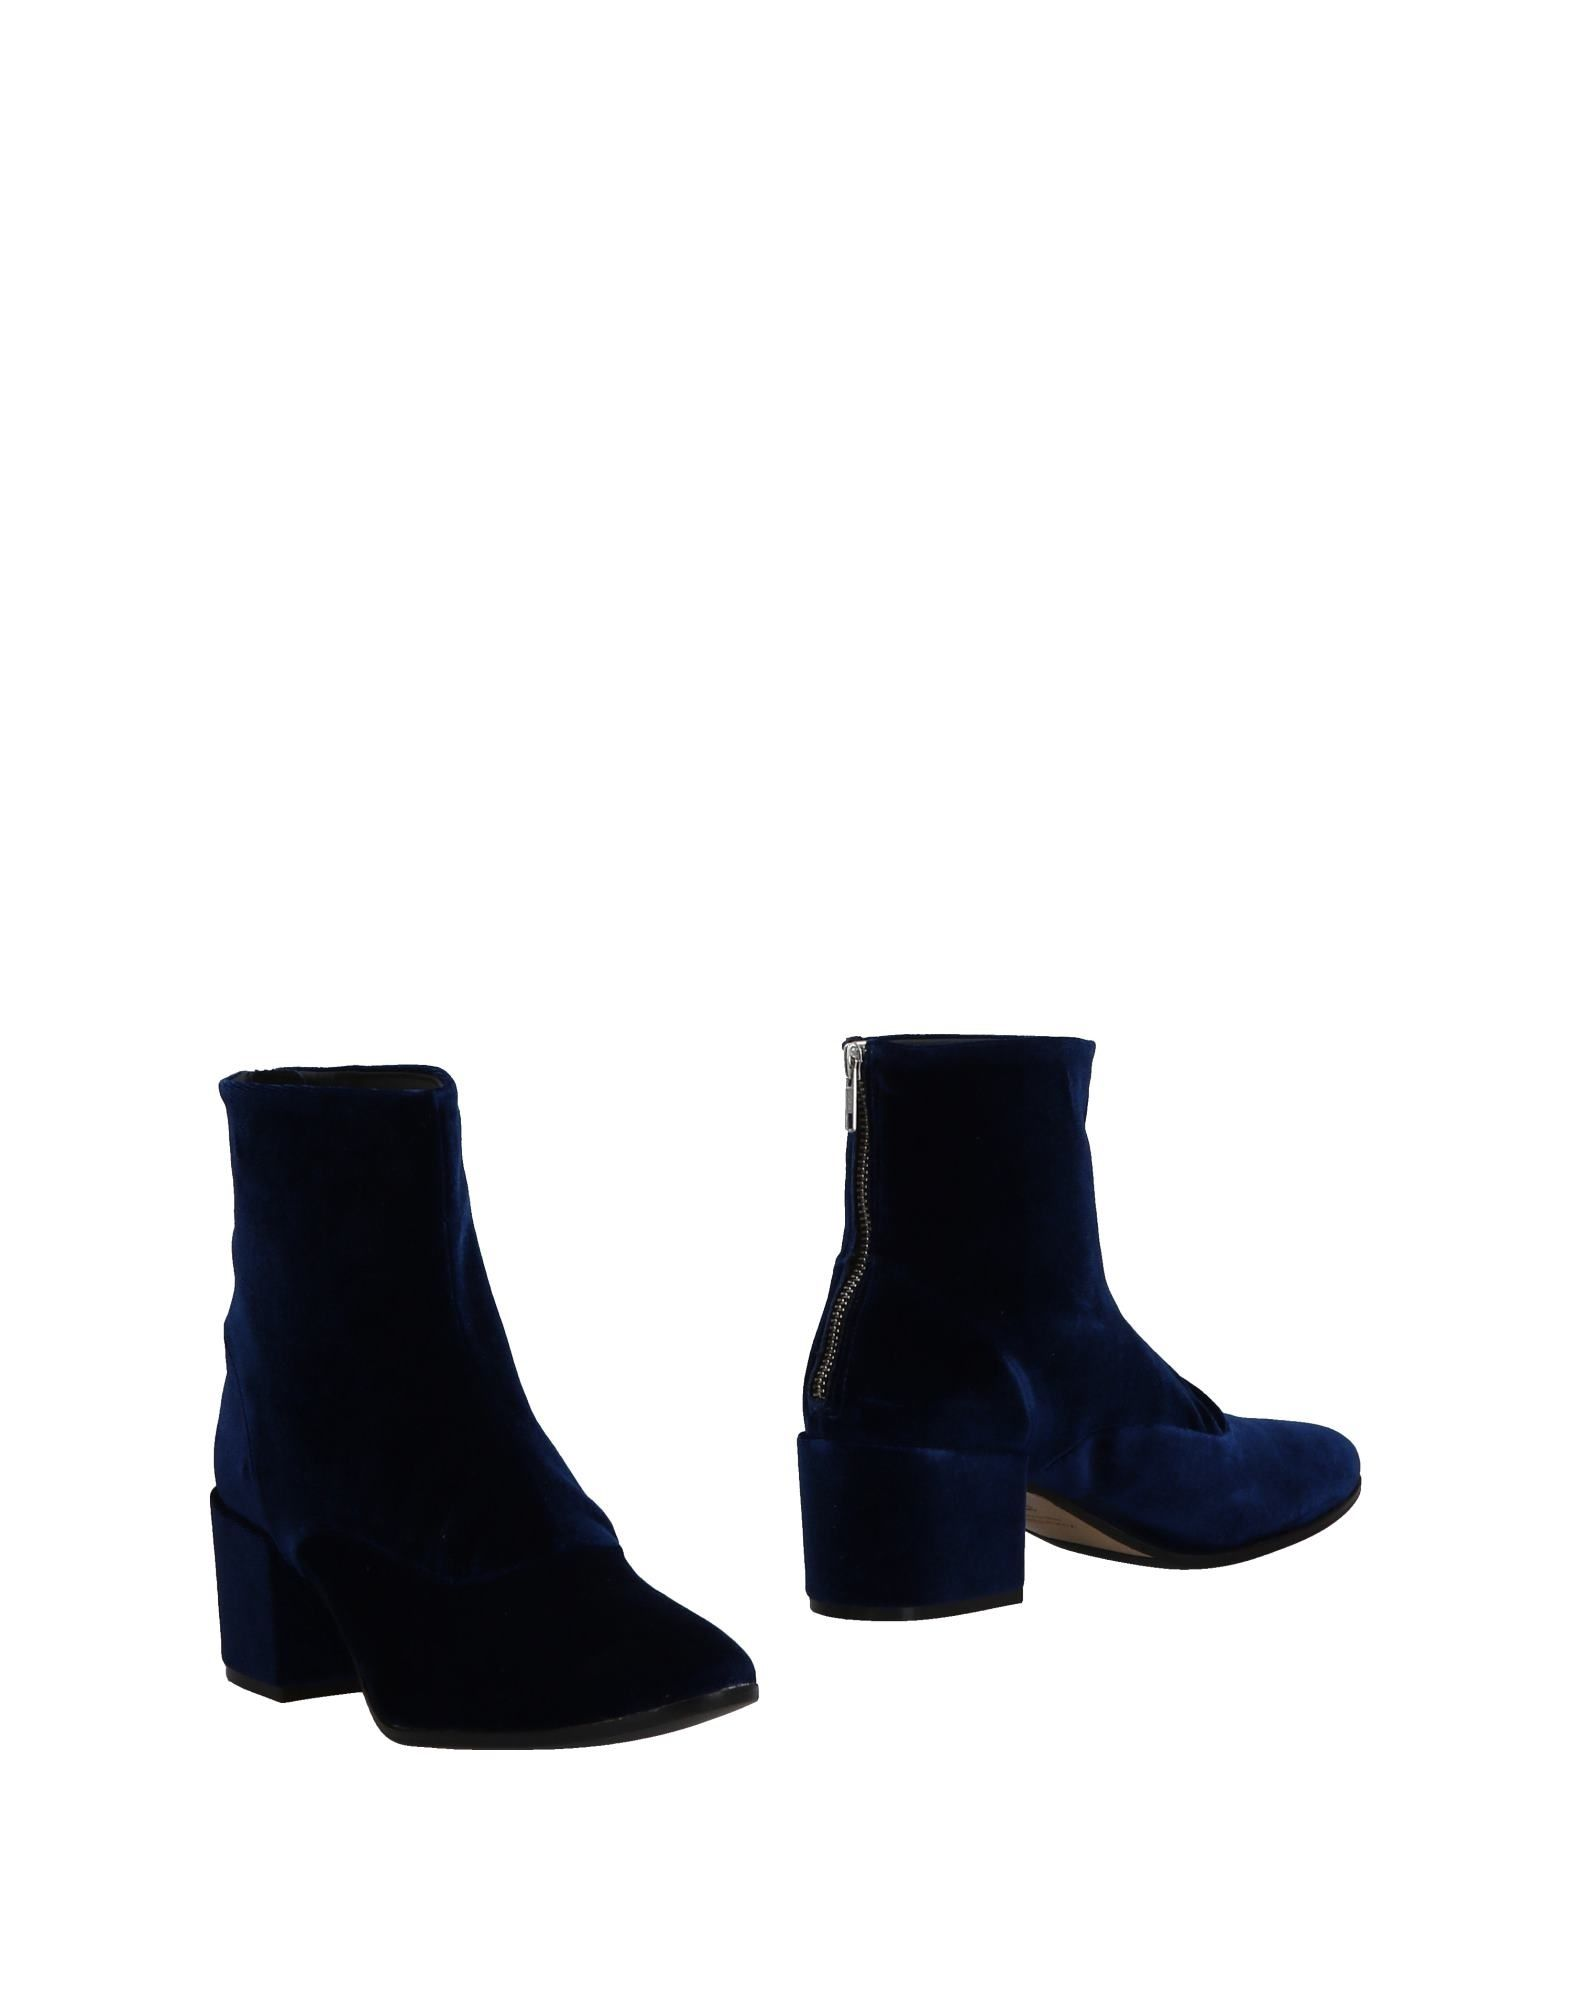 Rabatt Schuhe 11498553GW Preventi Stiefelette Damen  11498553GW Schuhe 4497e5